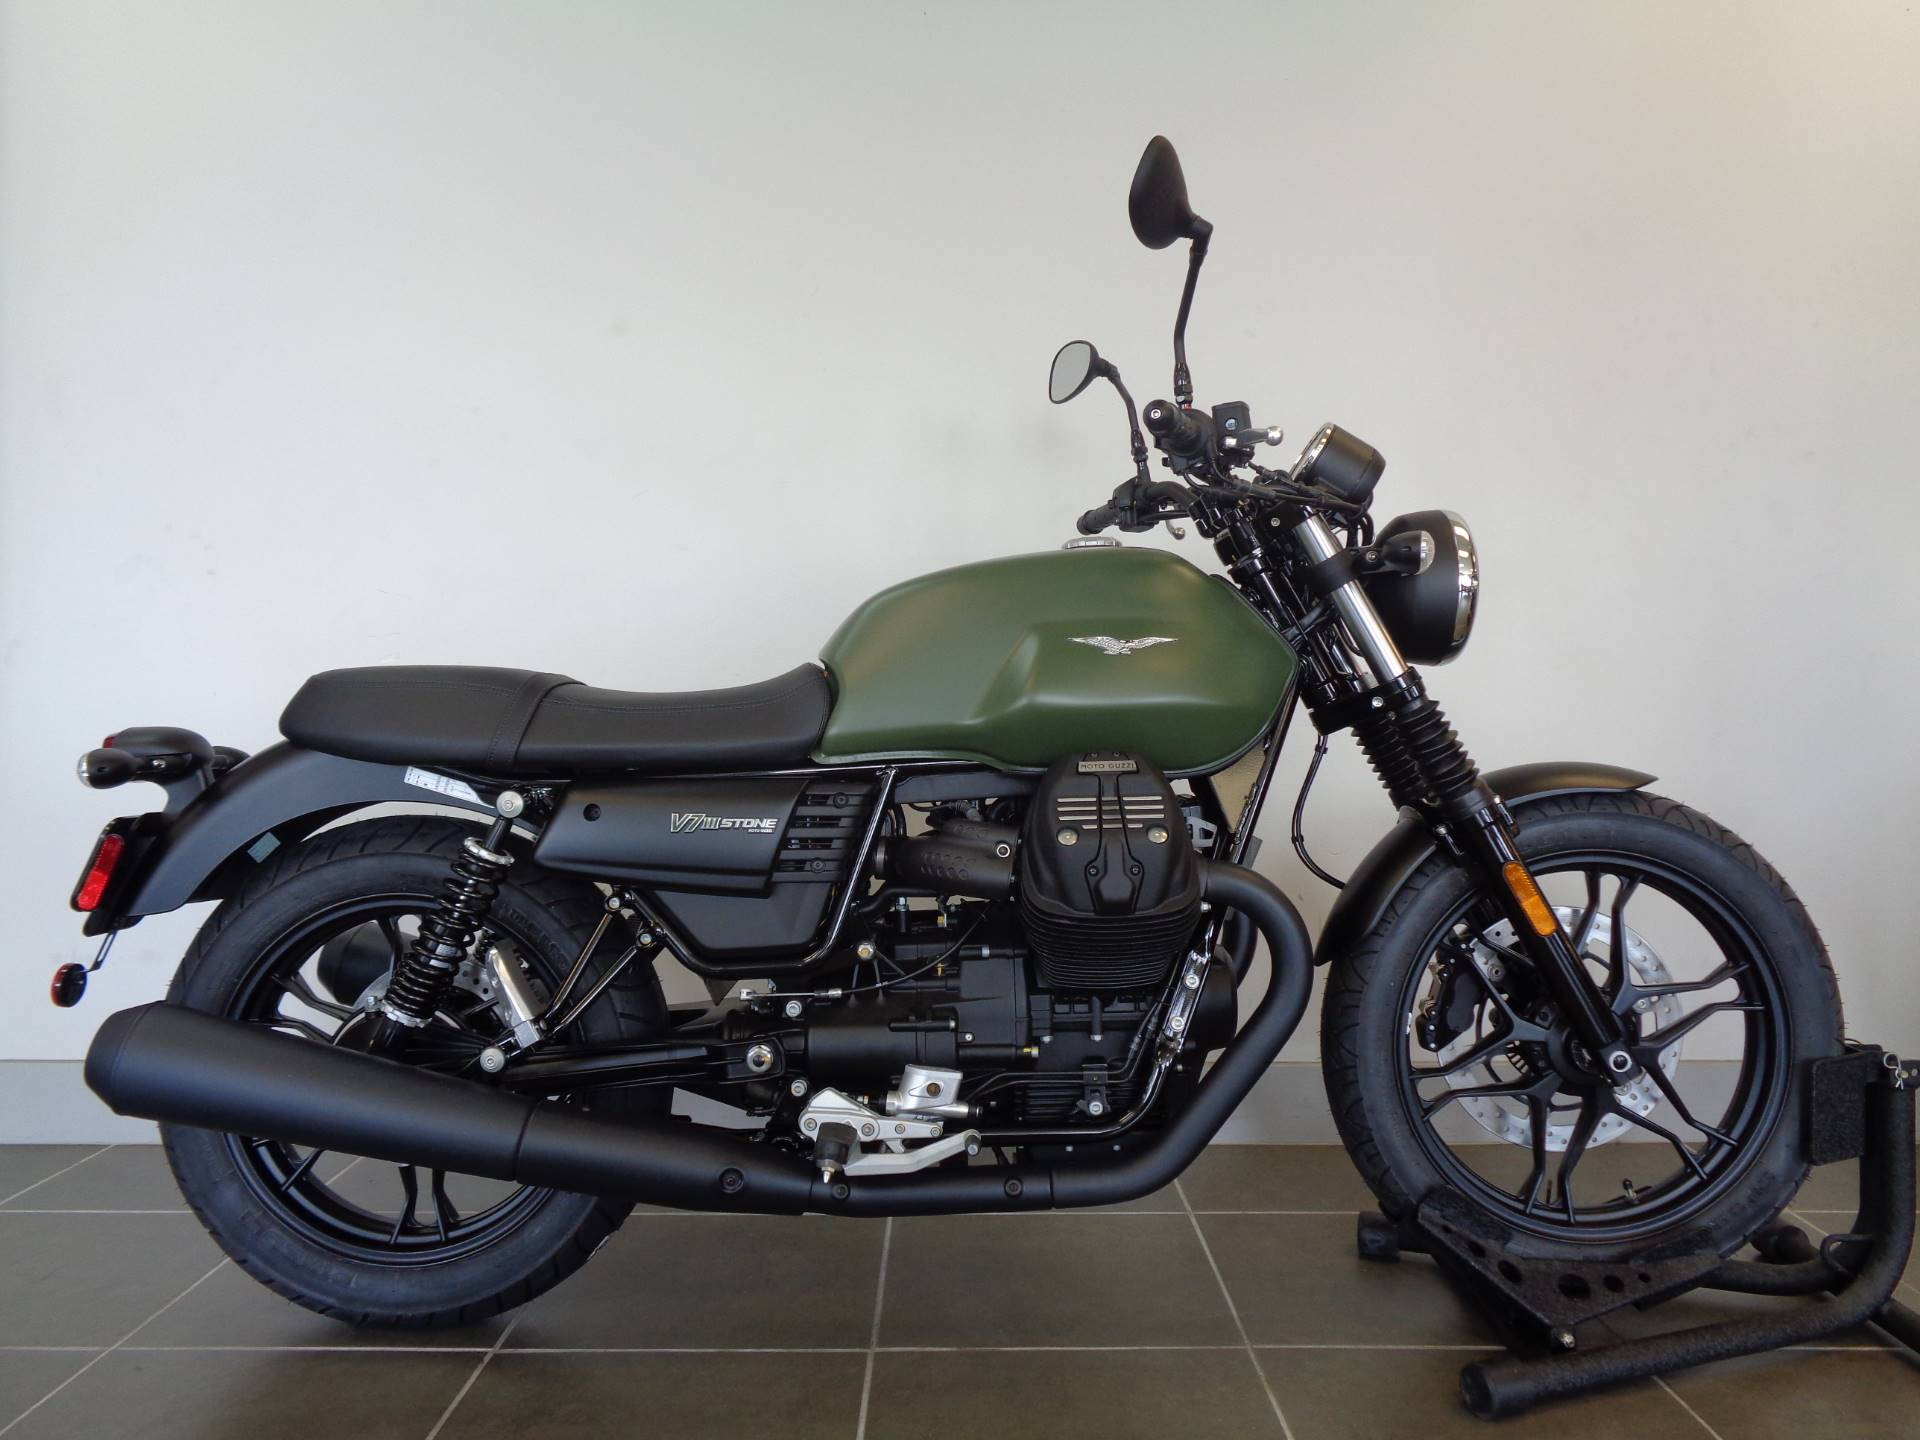 new 2018 moto guzzi v7 iii stone motorcycles in houston. Black Bedroom Furniture Sets. Home Design Ideas